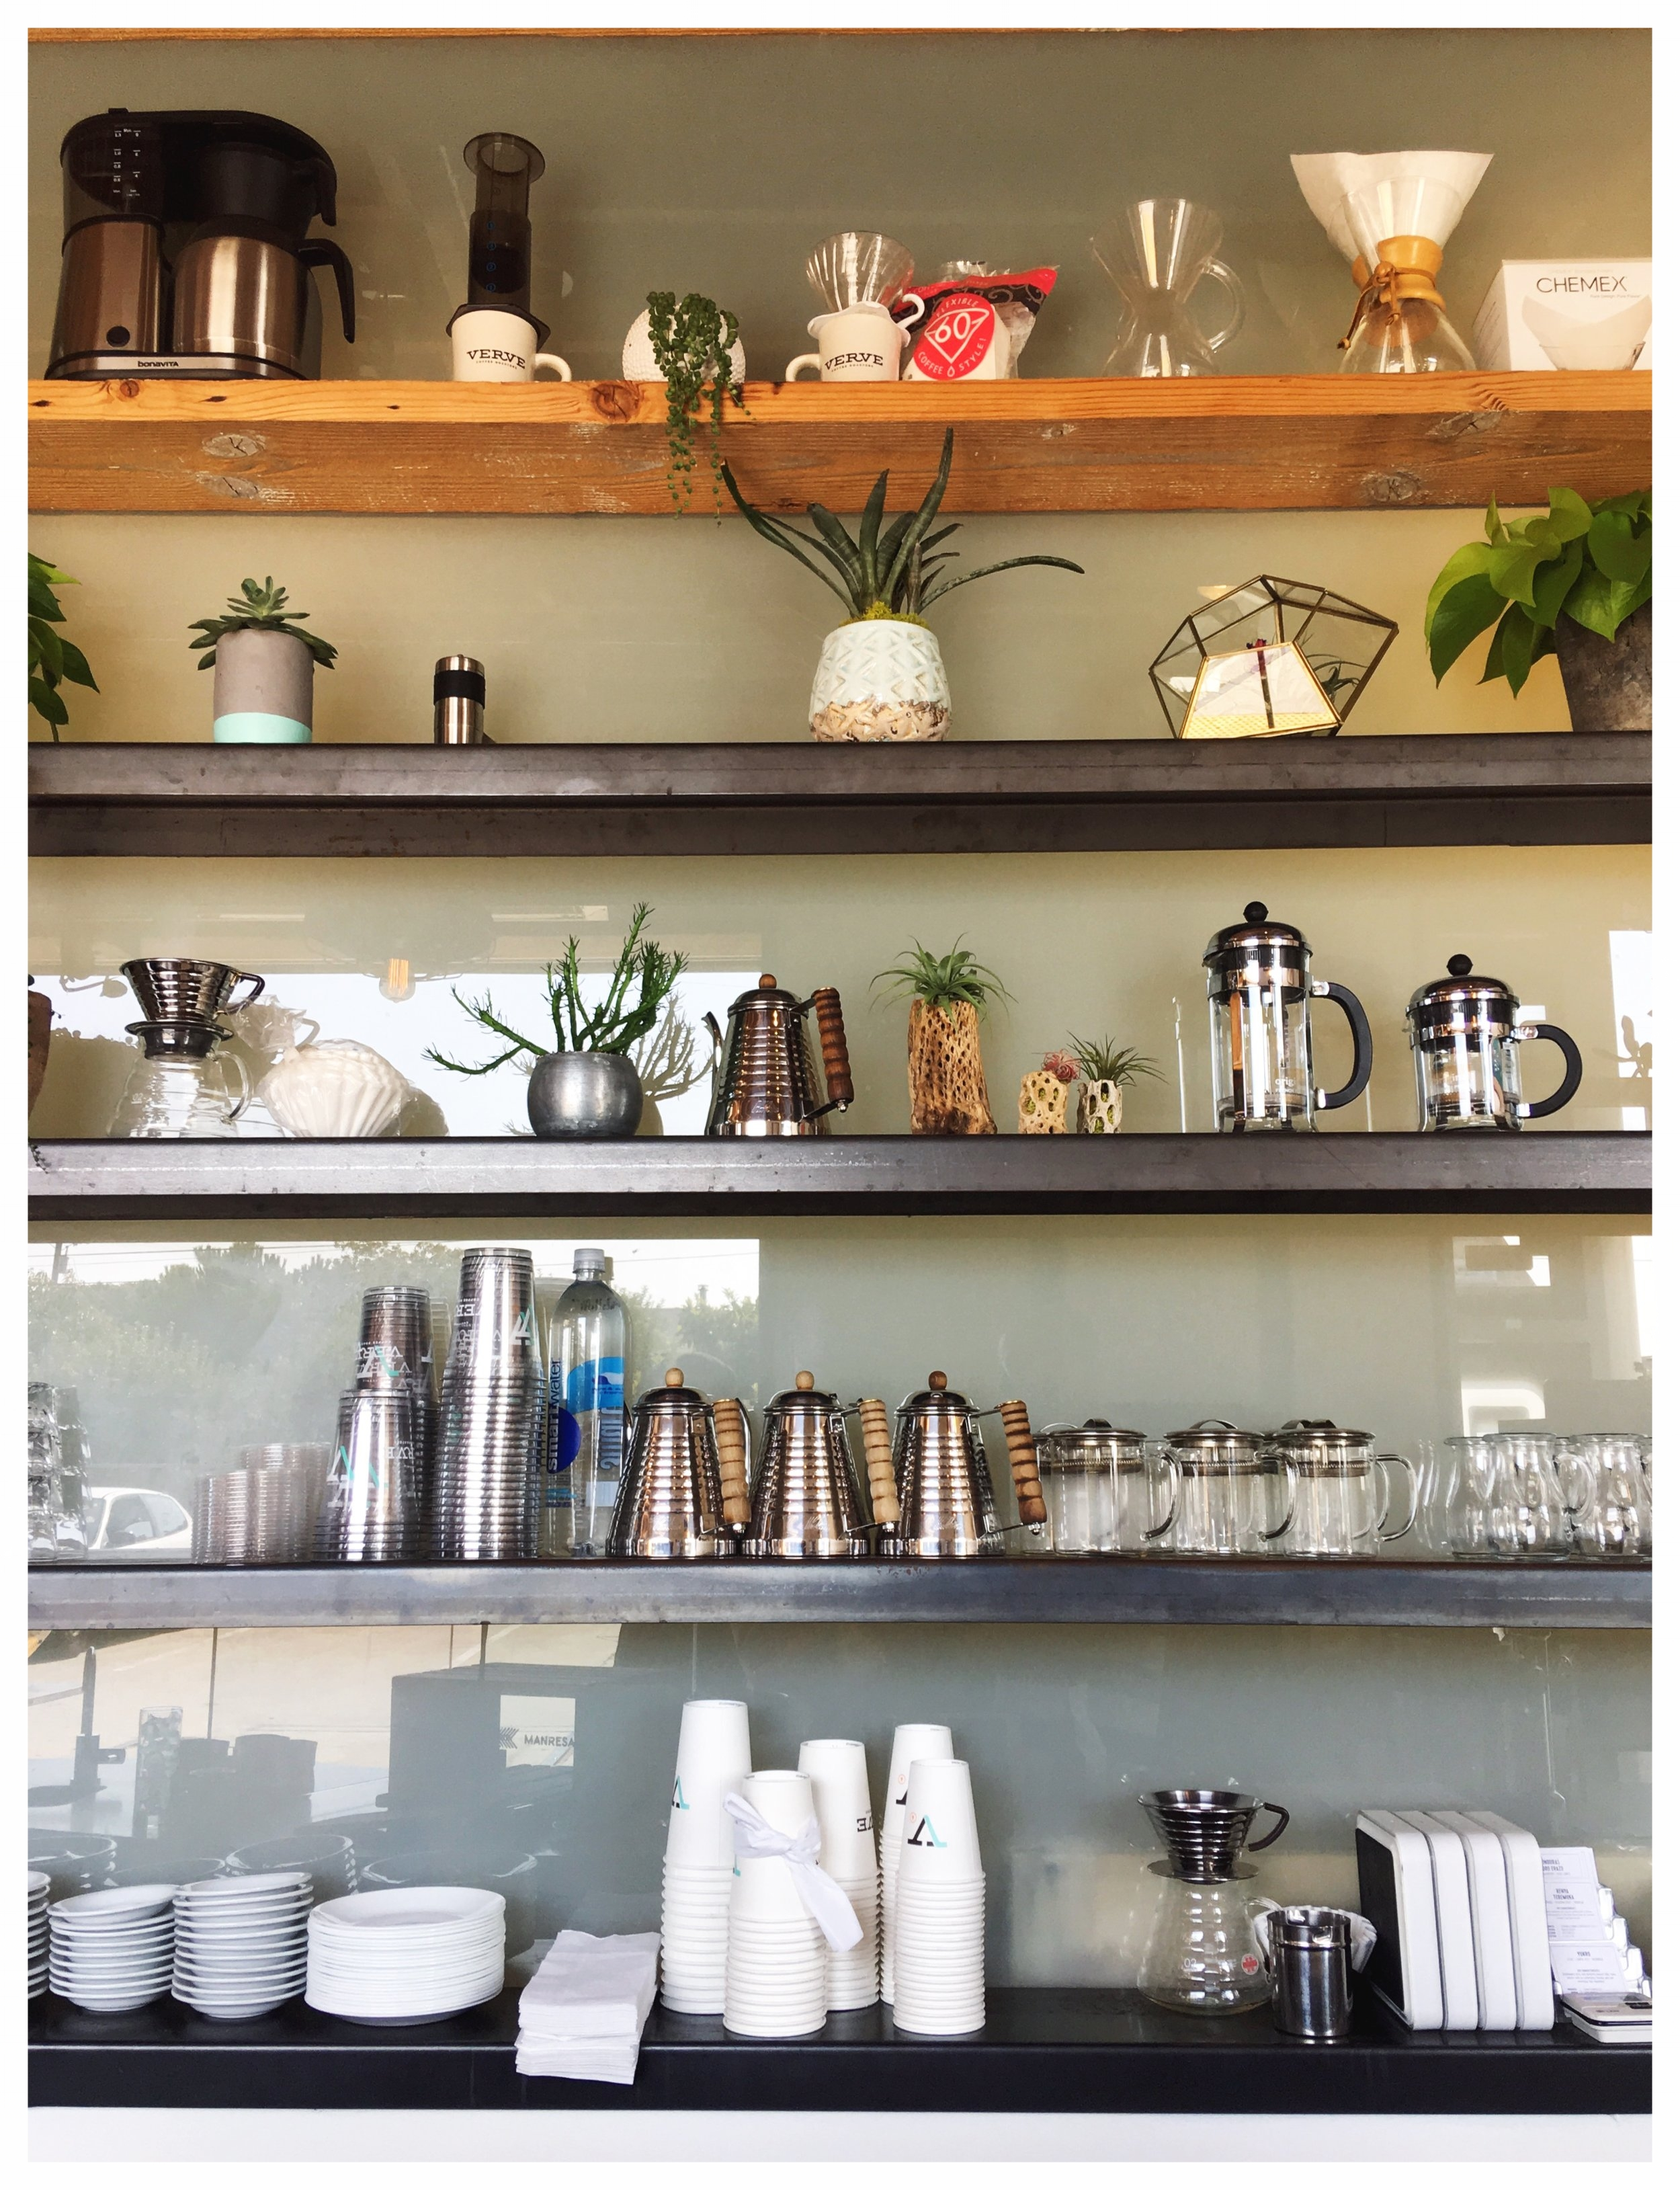 Verve Shelf Display in Warehouse